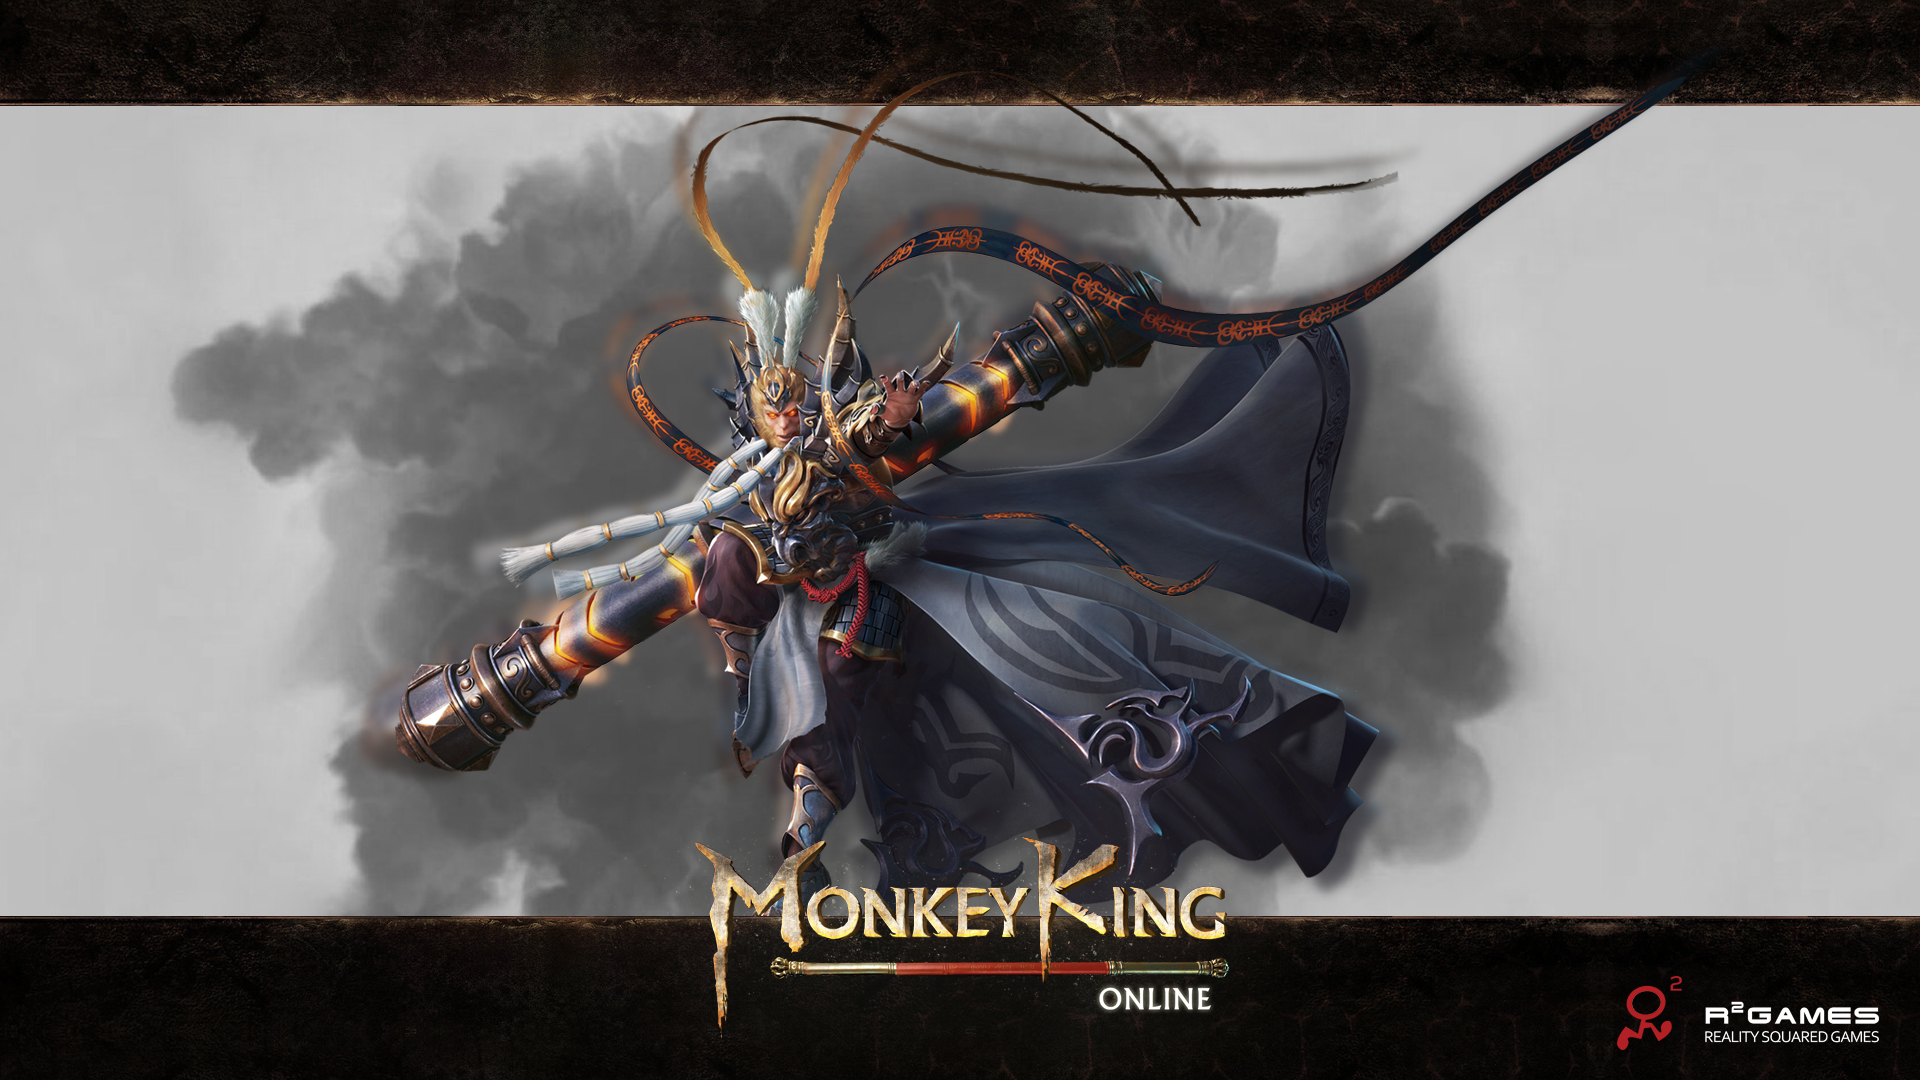 [monkey]_wallpaper3.jpg